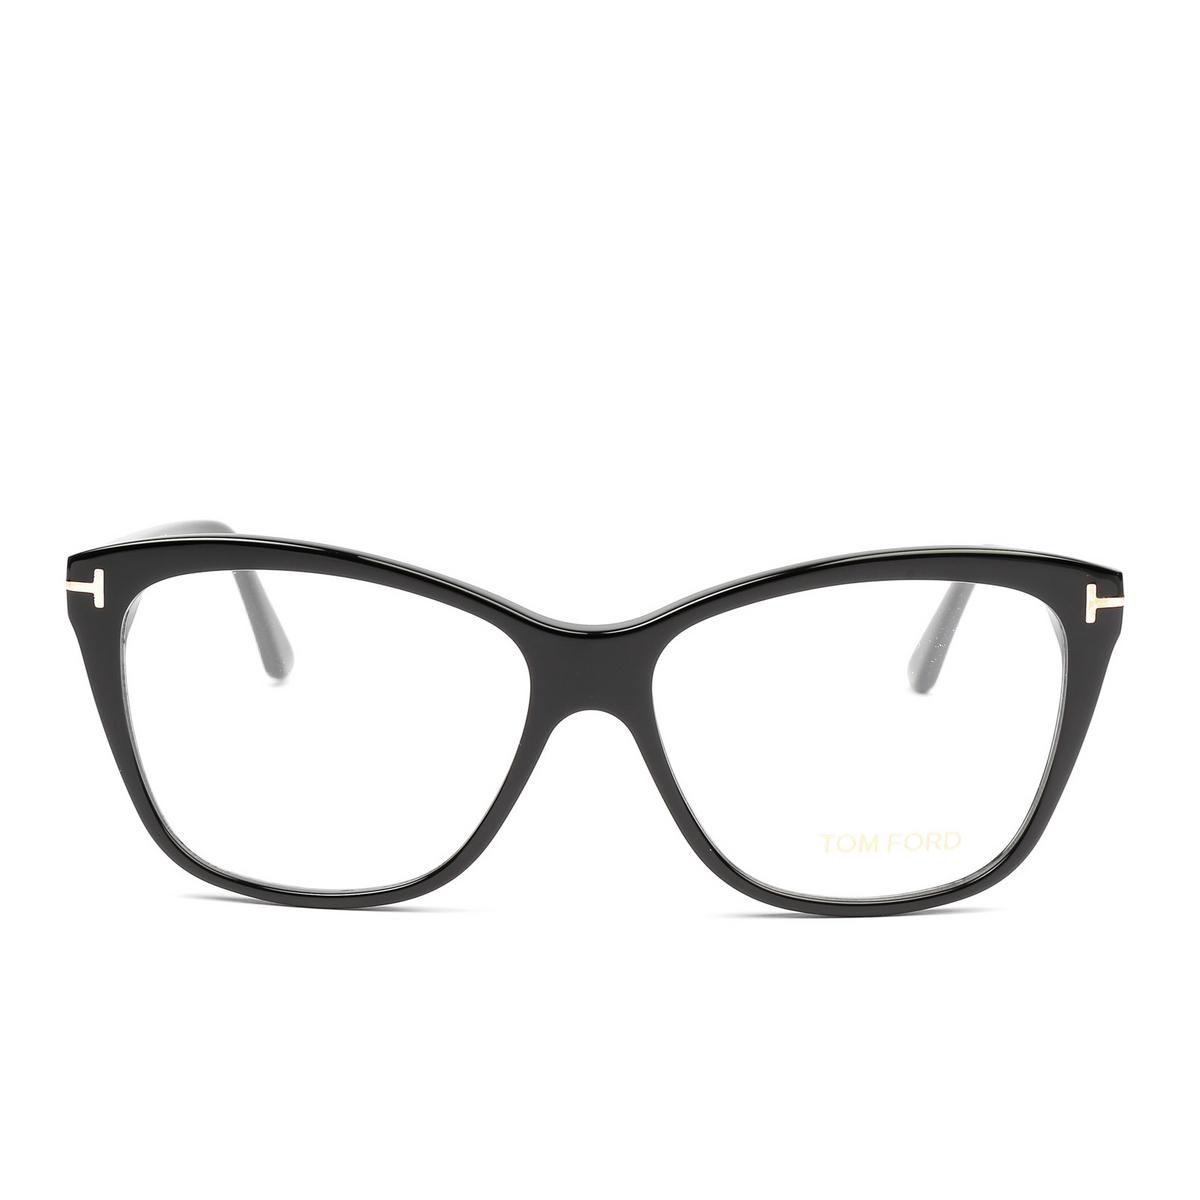 Tom Ford® Square Eyeglasses: FT5512 color Black 001 - front view.